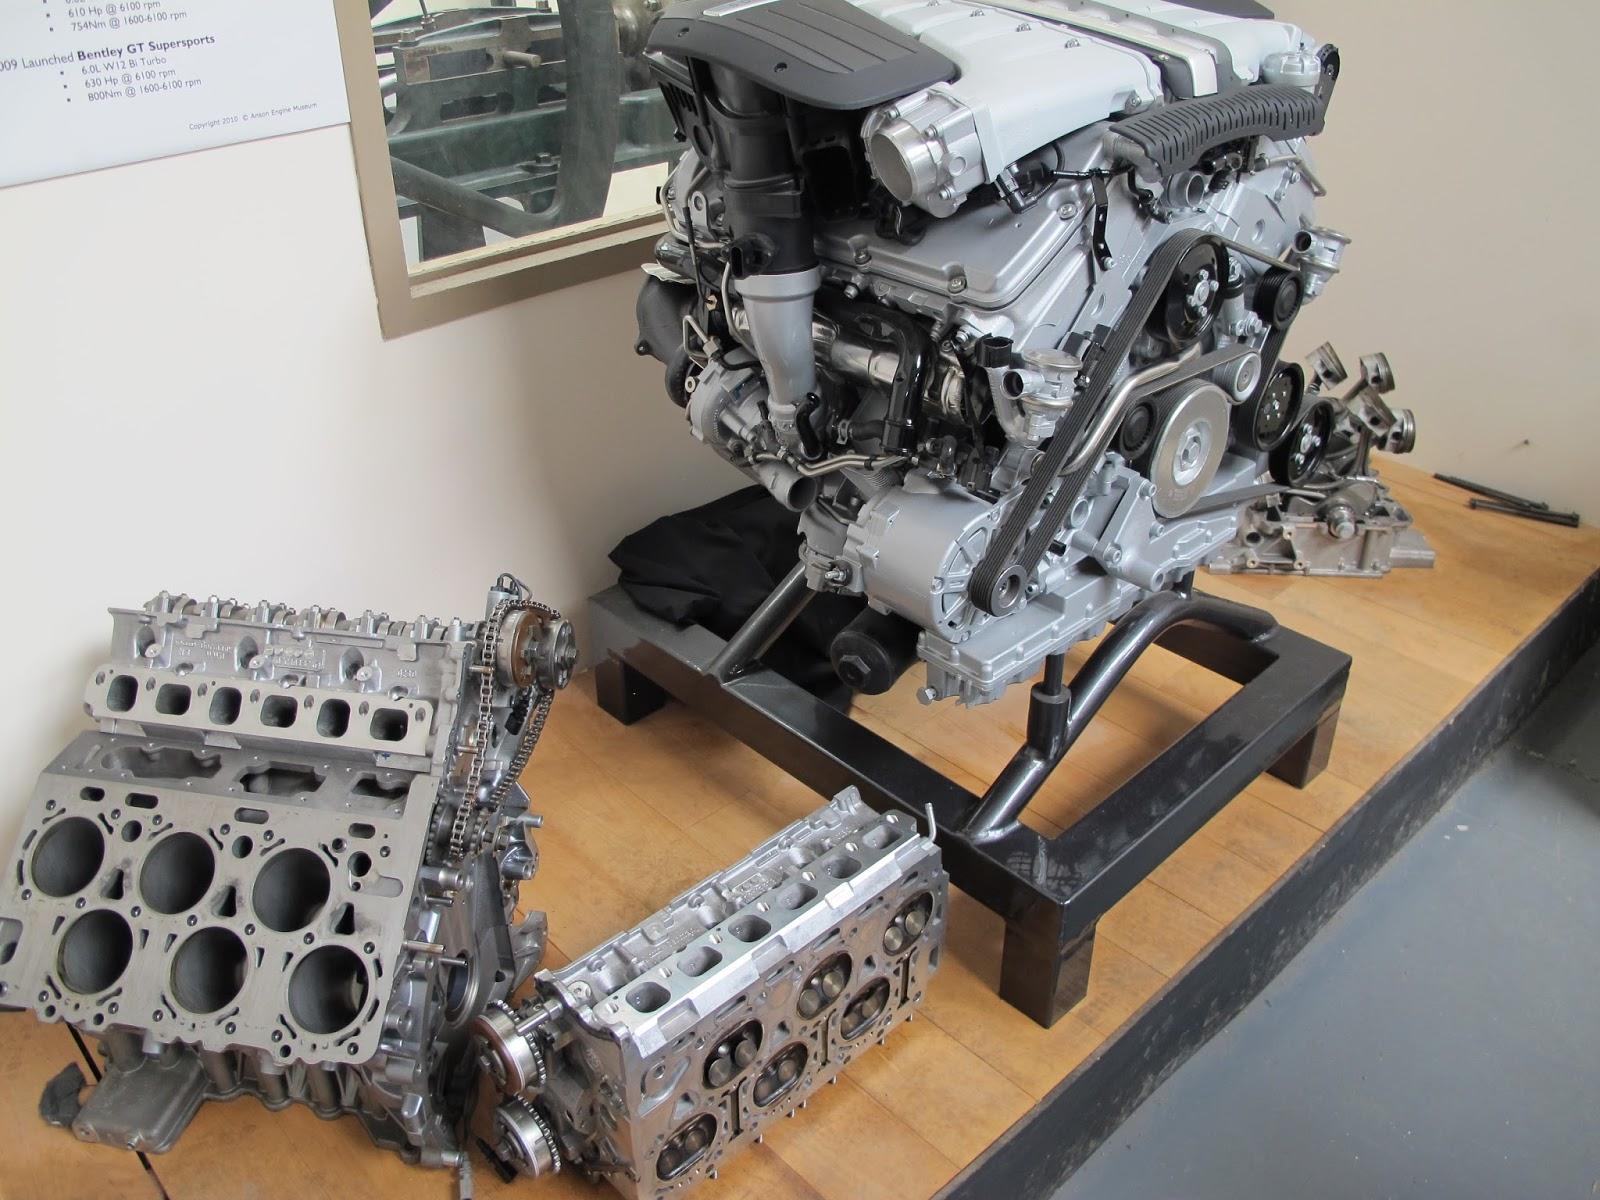 W12 Engine Configuration It's a Bentley W12 Car Engine